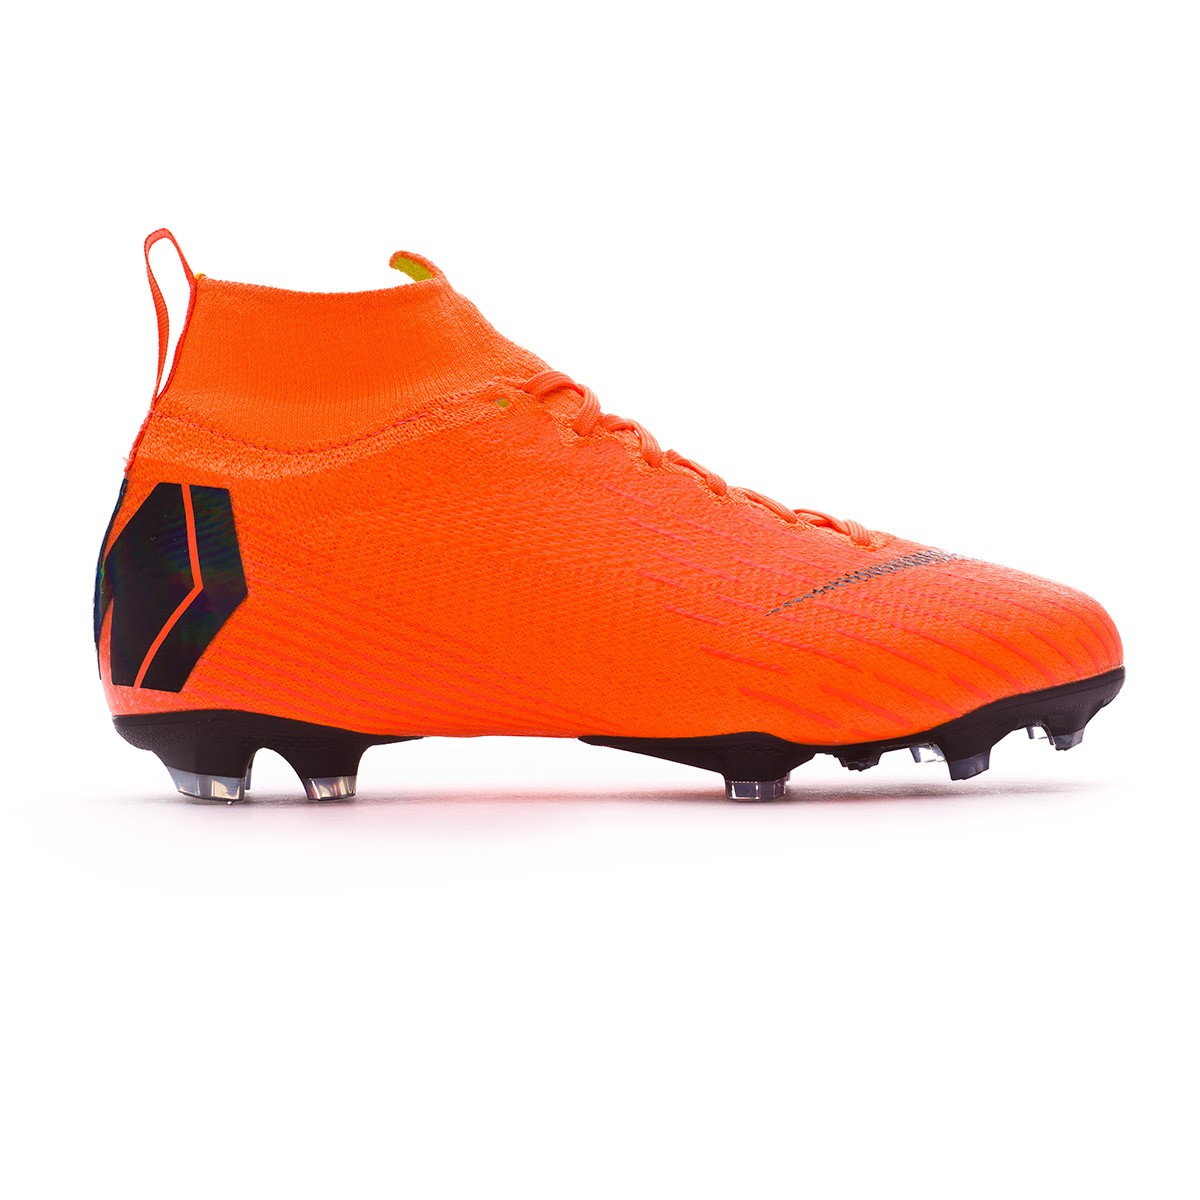 4168dbee7ebe Football Boots Nike Kids Mercurial Superfly VI Elite FG Total  orange-Black-Volt - Football store Fútbol Emotion